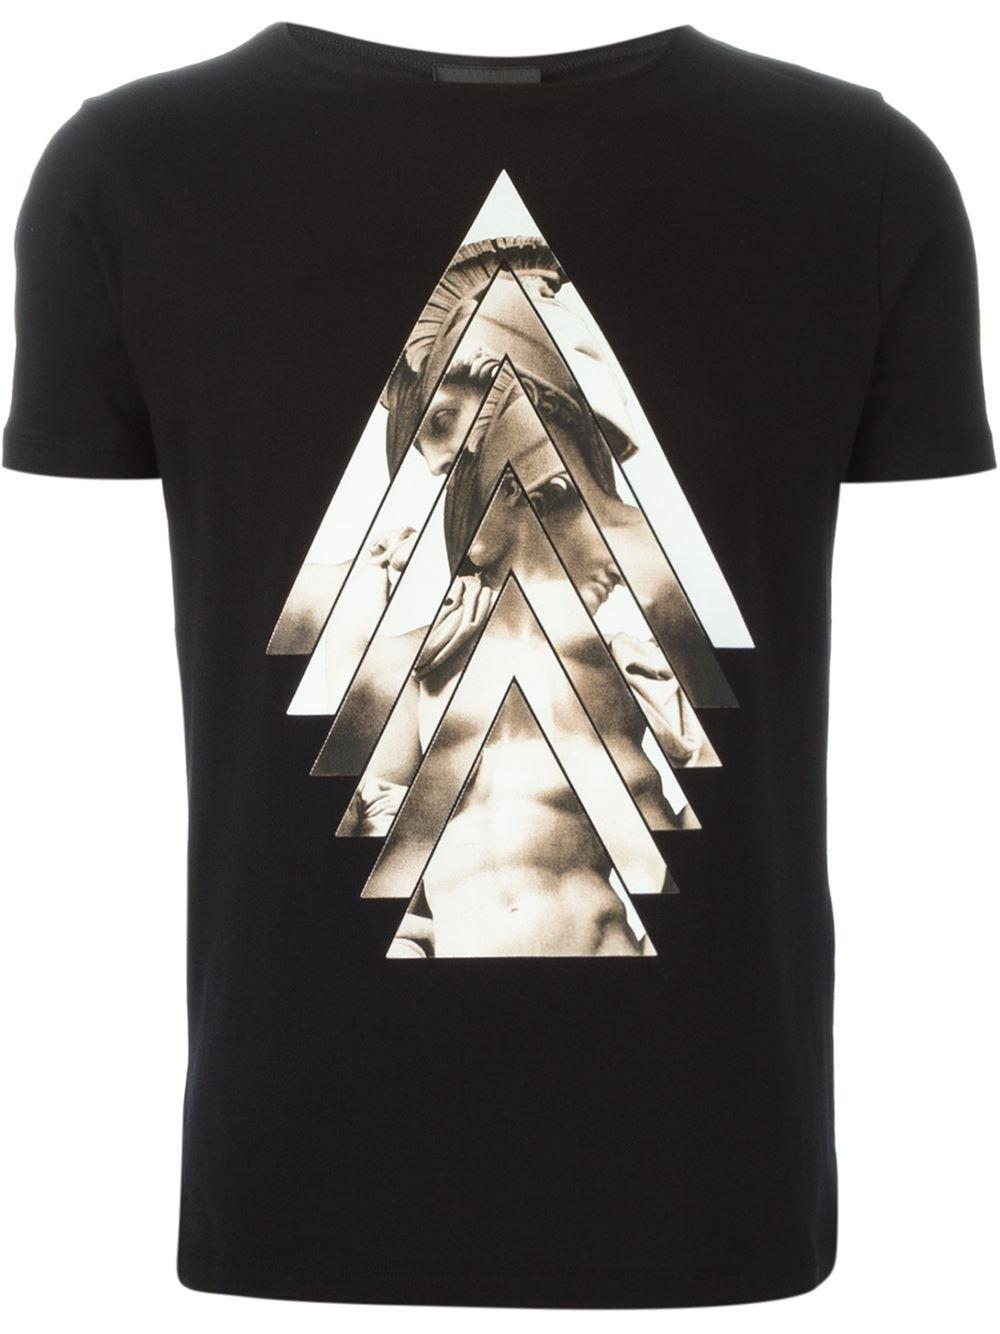 Emporio Armani 39 David 39 Print T Shirt In Black For Men Lyst